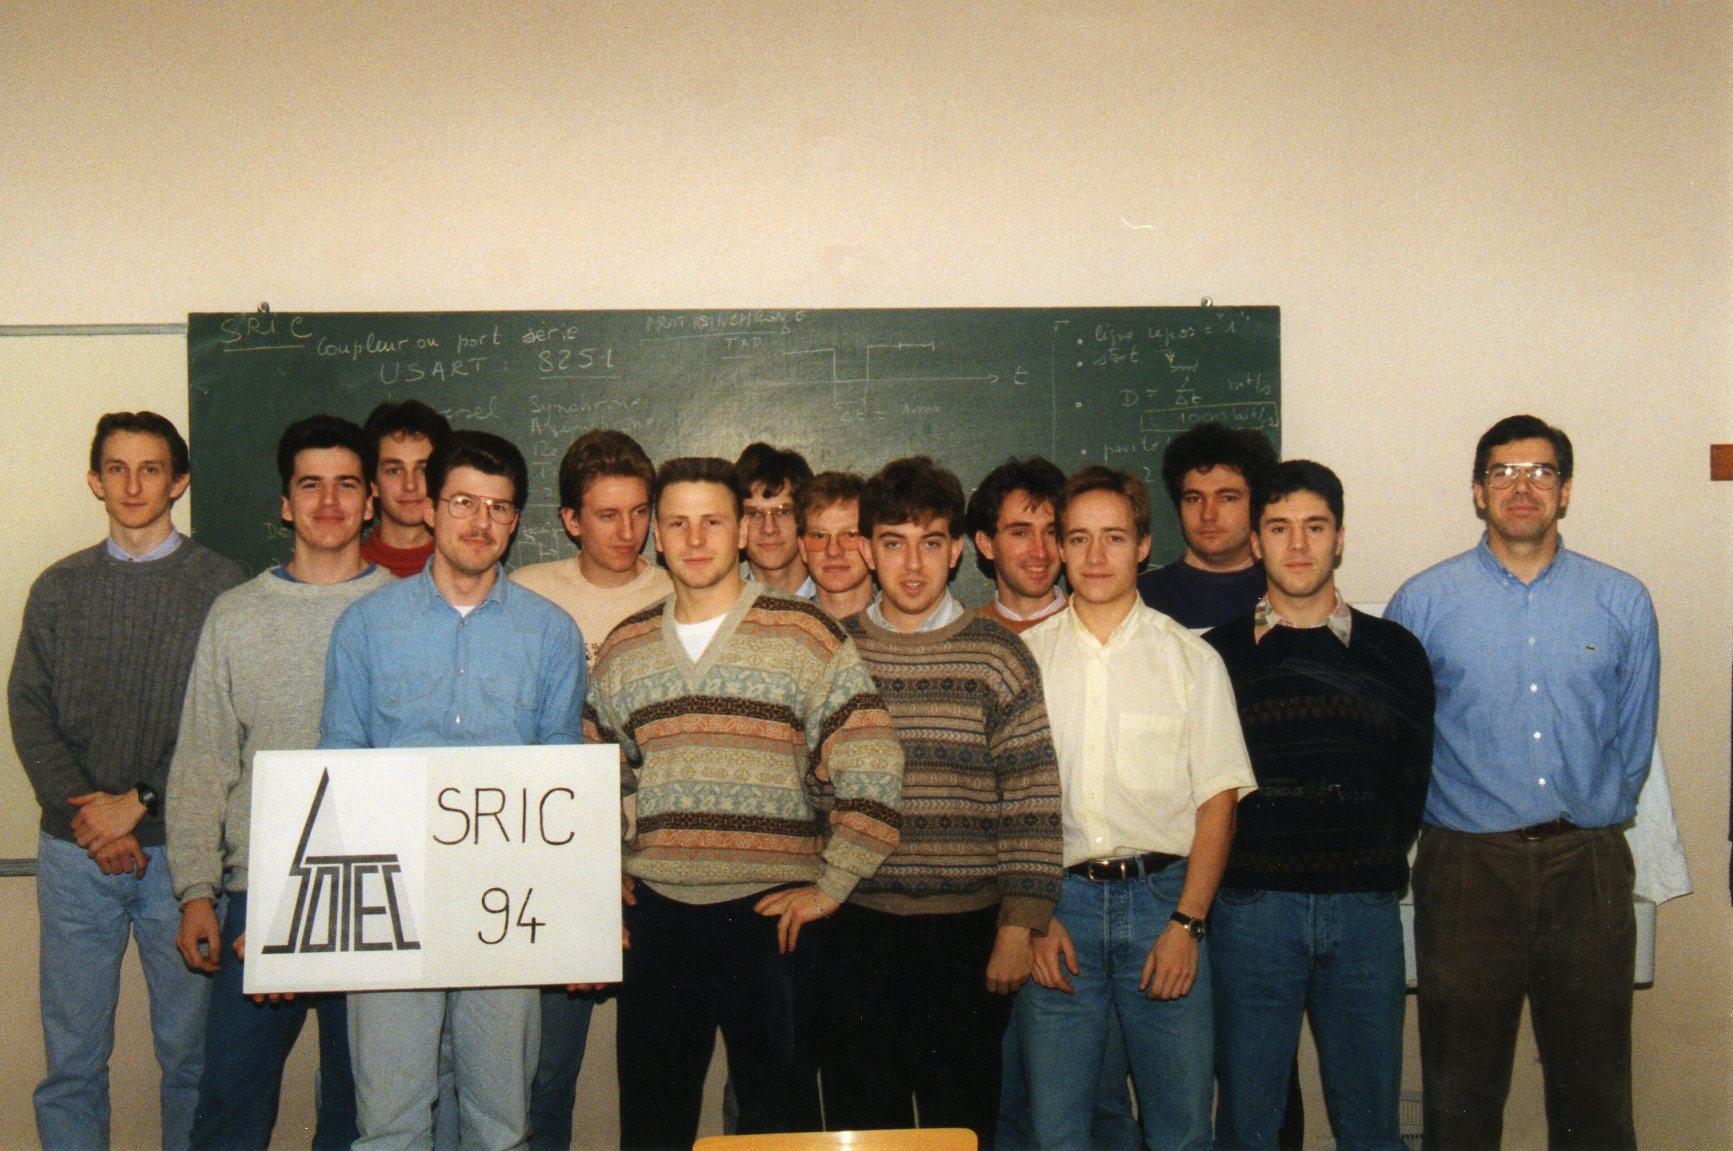 SRIC_.jpg